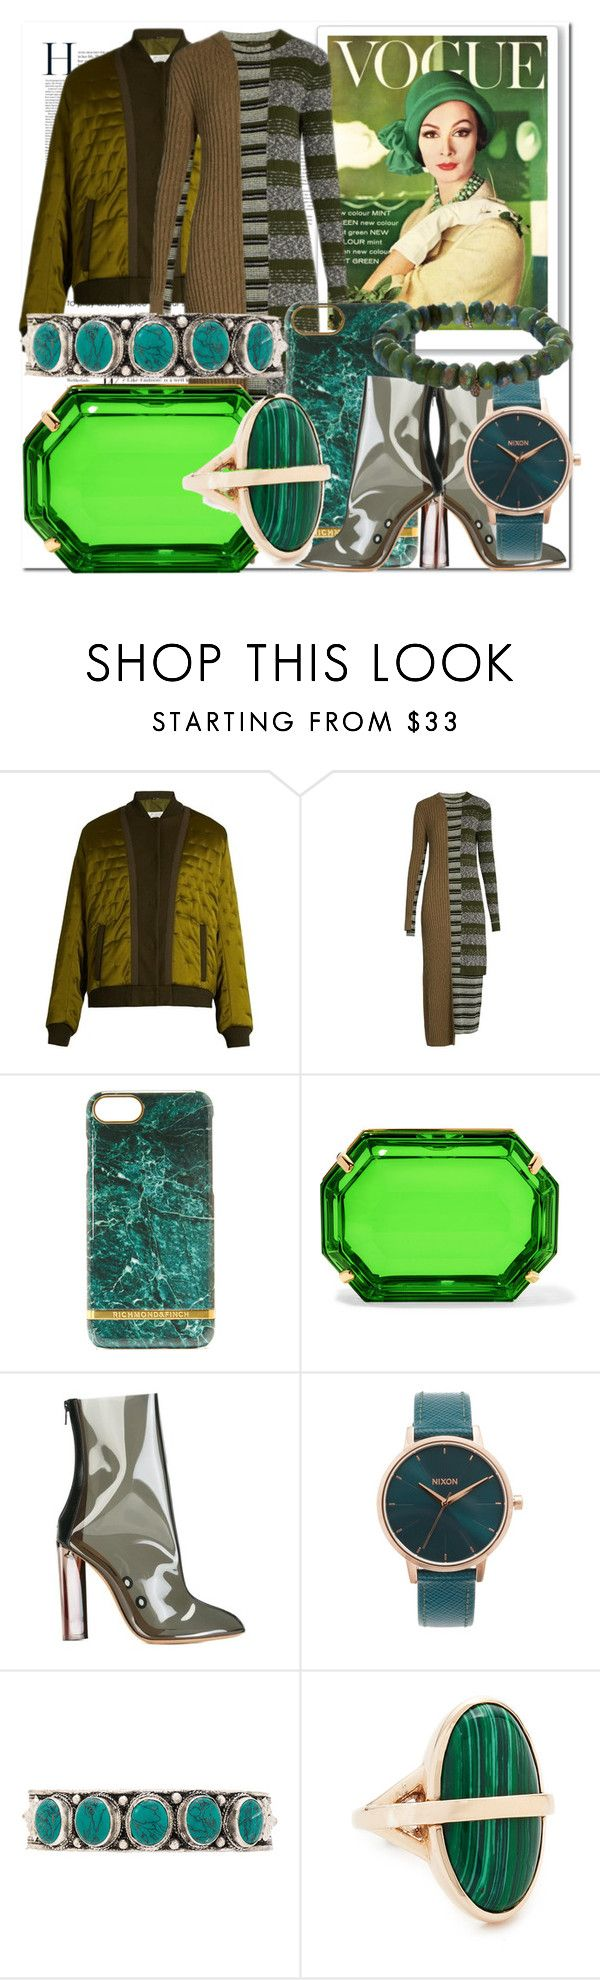 """Weekend Fashion in Green!!"" by stylediva20 on Polyvore featuring Maison Margiela, Charlotte Olympia, adidas Originals, Nixon, Natalie B, Pamela Love and Sydney Evan"